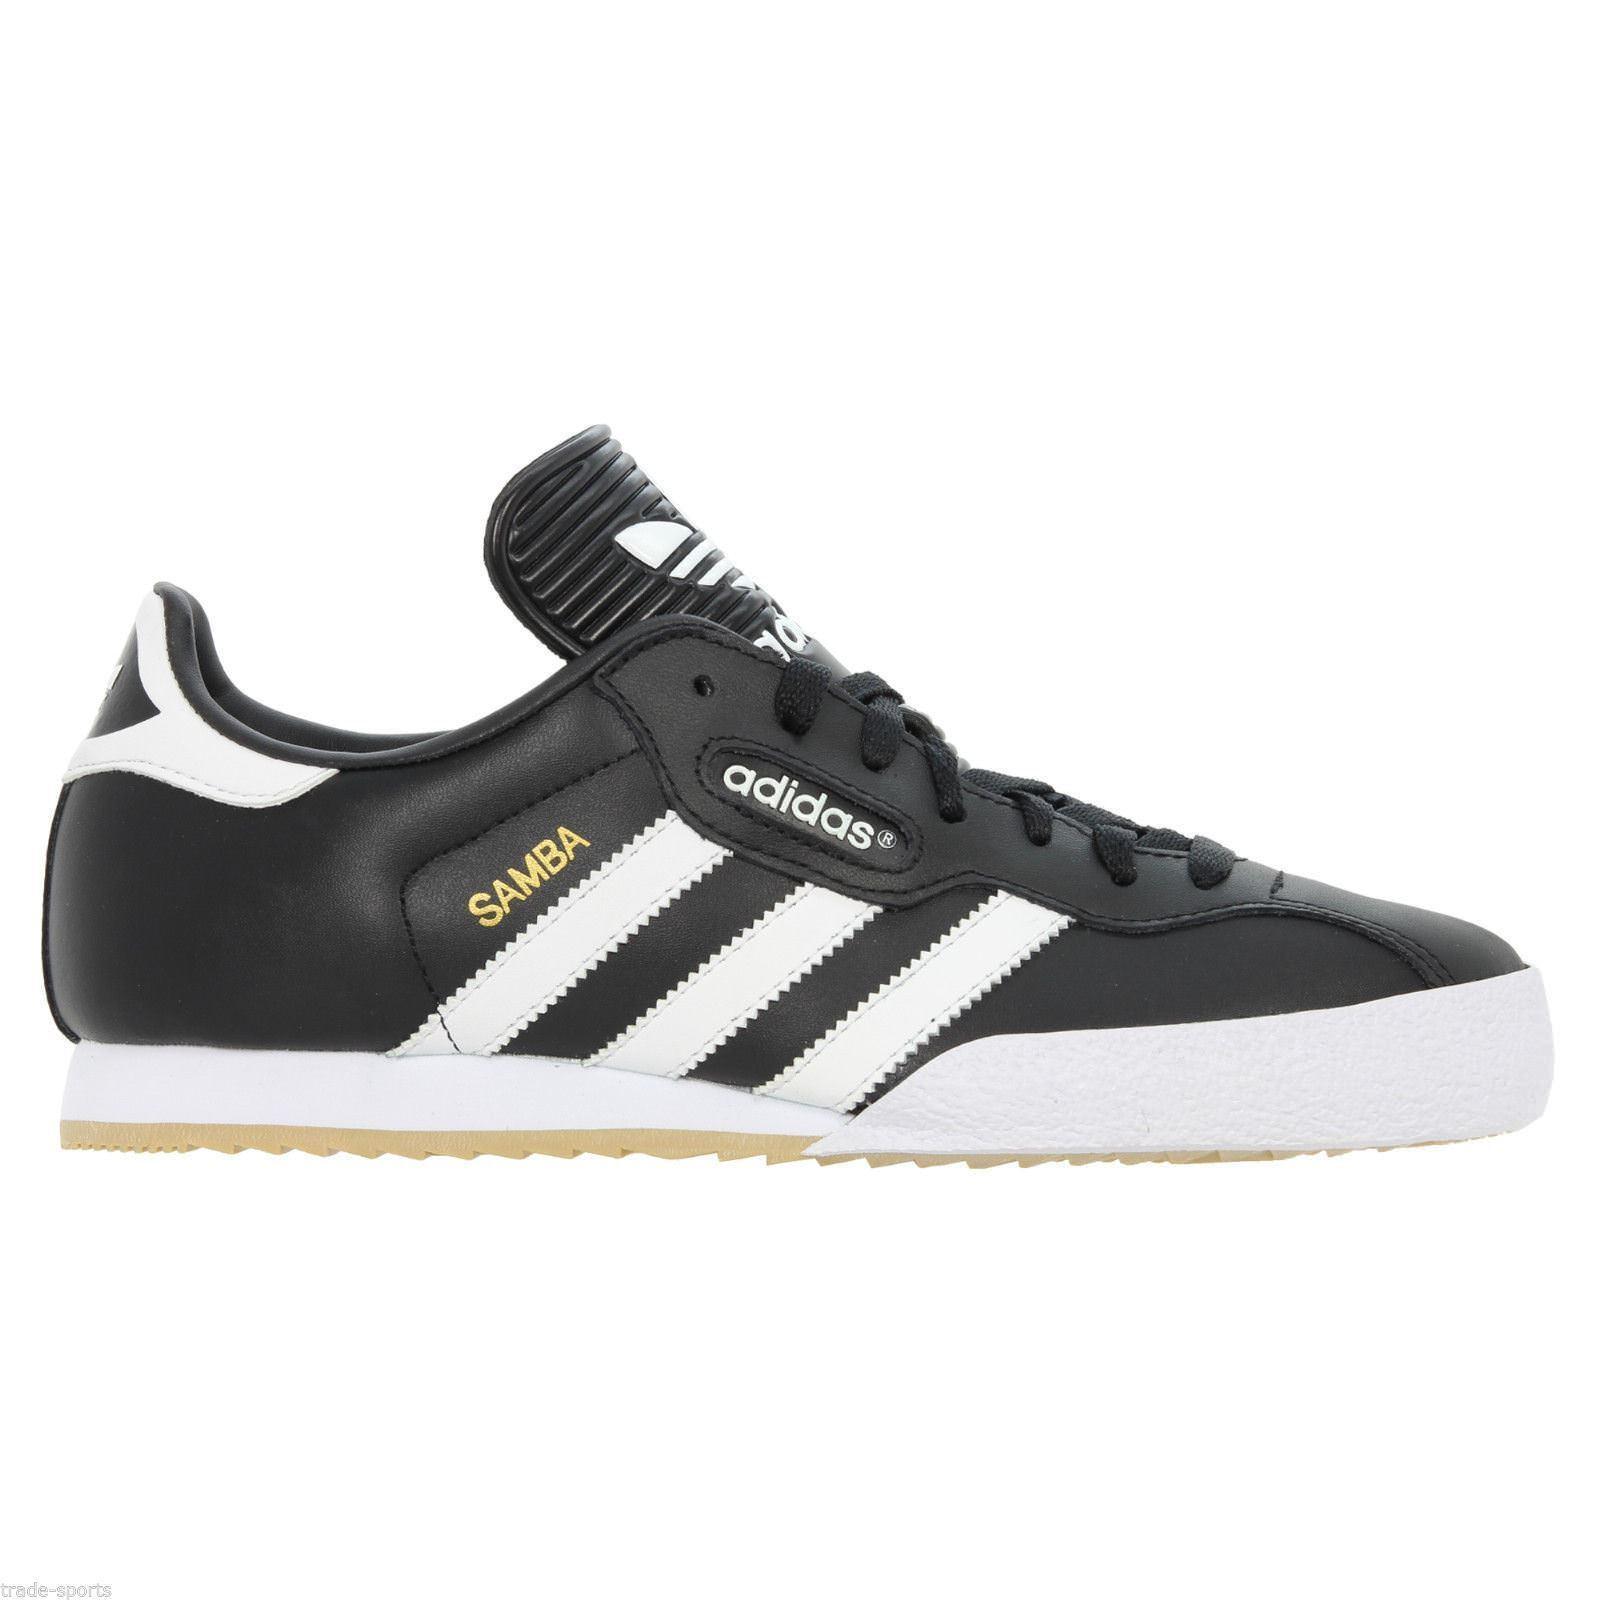 Details about adidas ORIGINALS MENS SAMBA SUPER UK SIZE 7 8 9 10 11 12 TRAINERS SHOES NEW